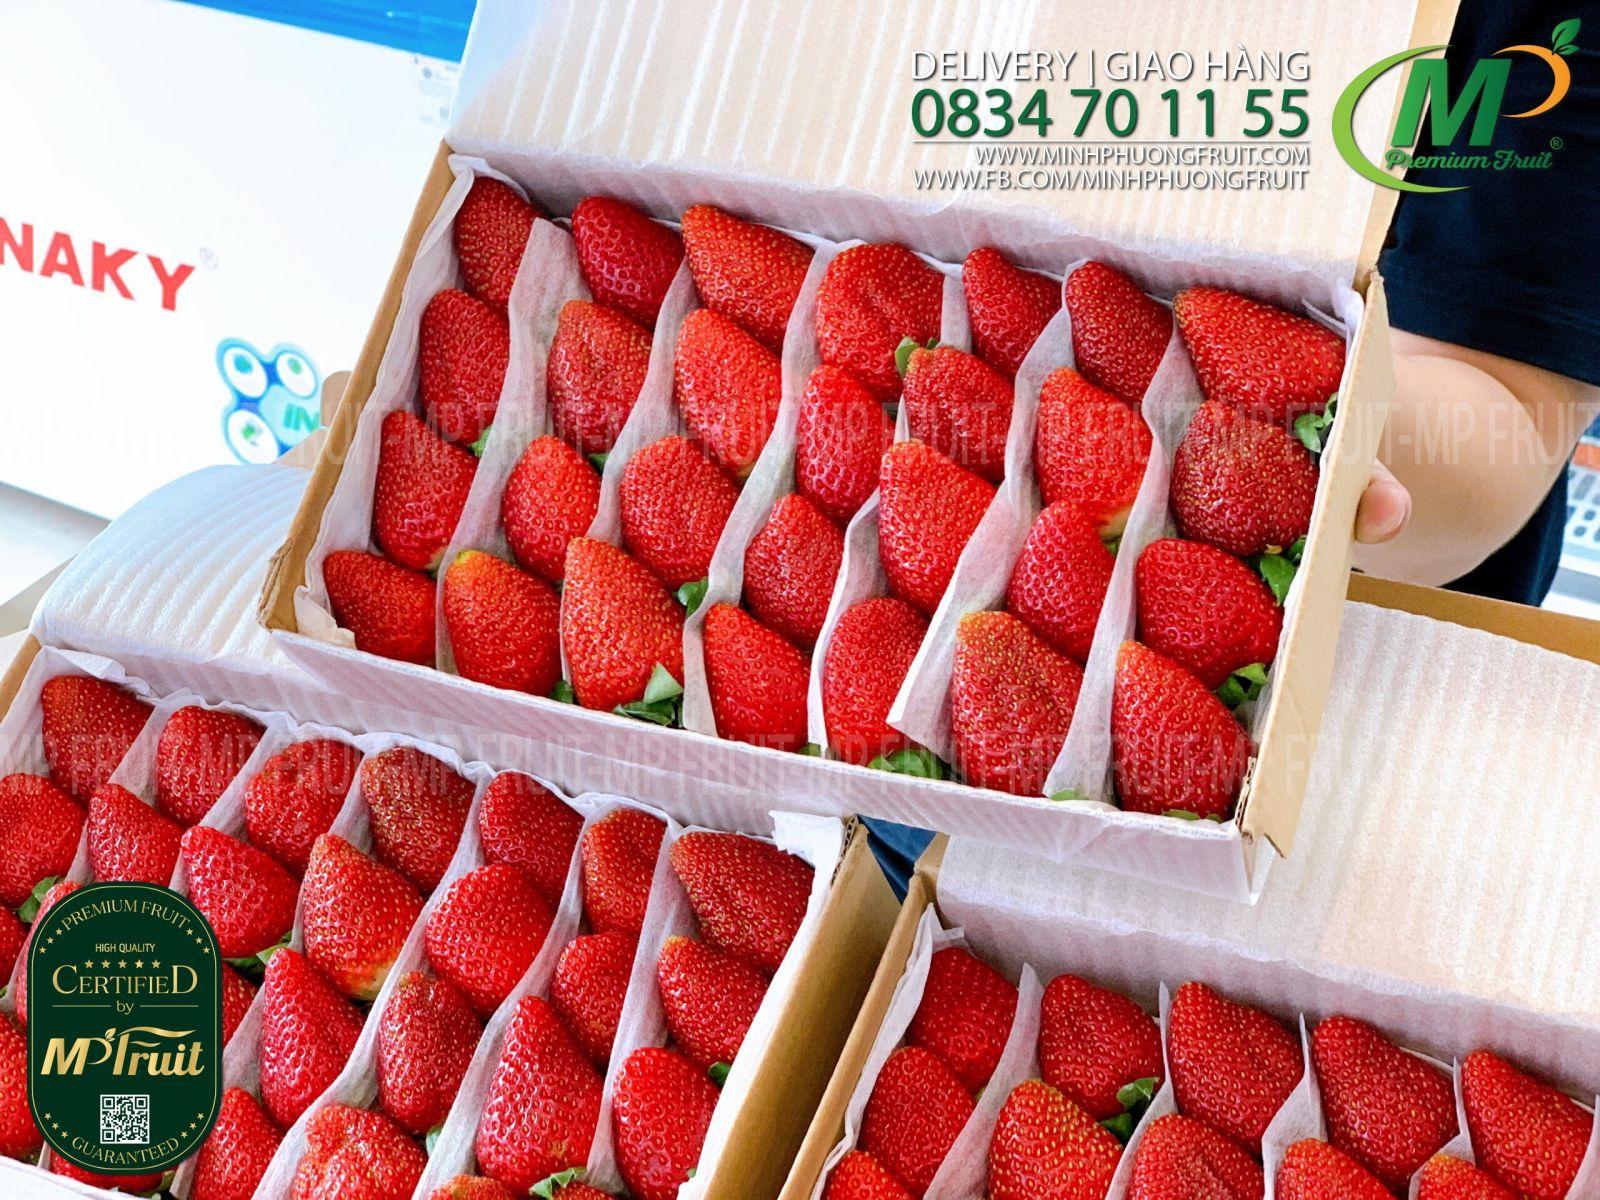 Dâu Giống Mỹ Wonderland Farm Size 28 trái Hộp 500g tại MP Fruits